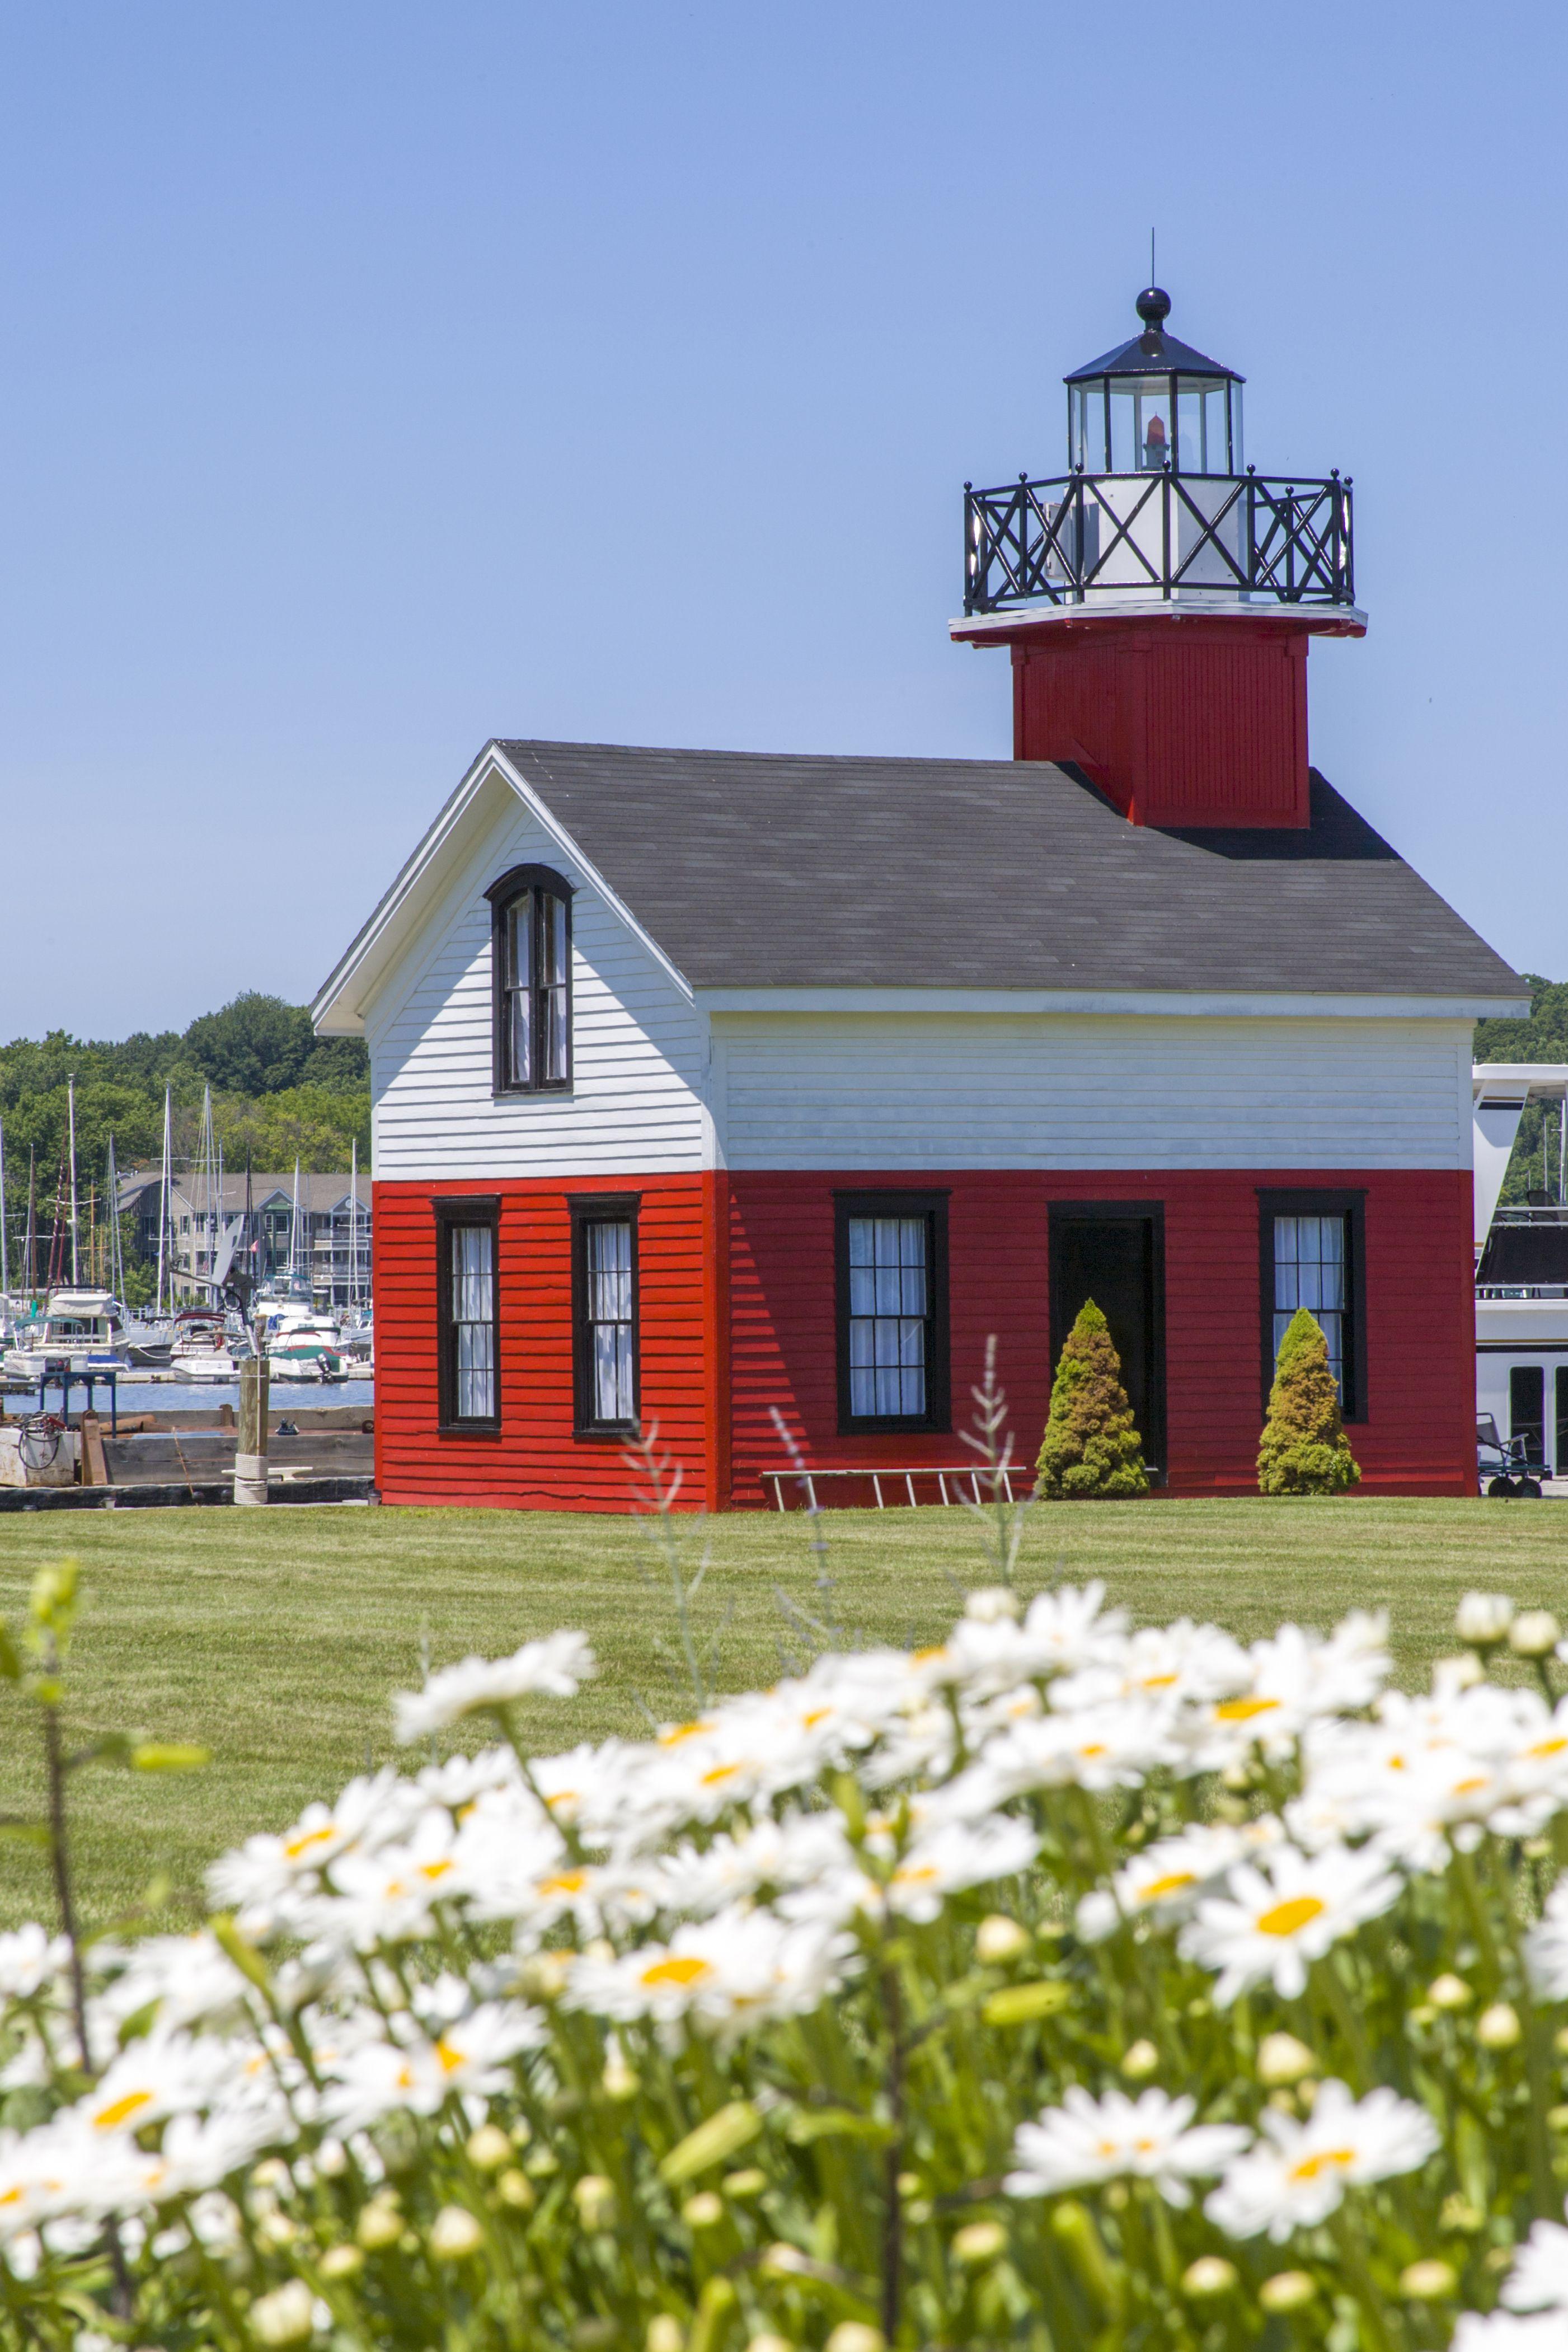 Old Lighthouse on Lake Kalamazoo, Saugatuck, West Michigan, USA